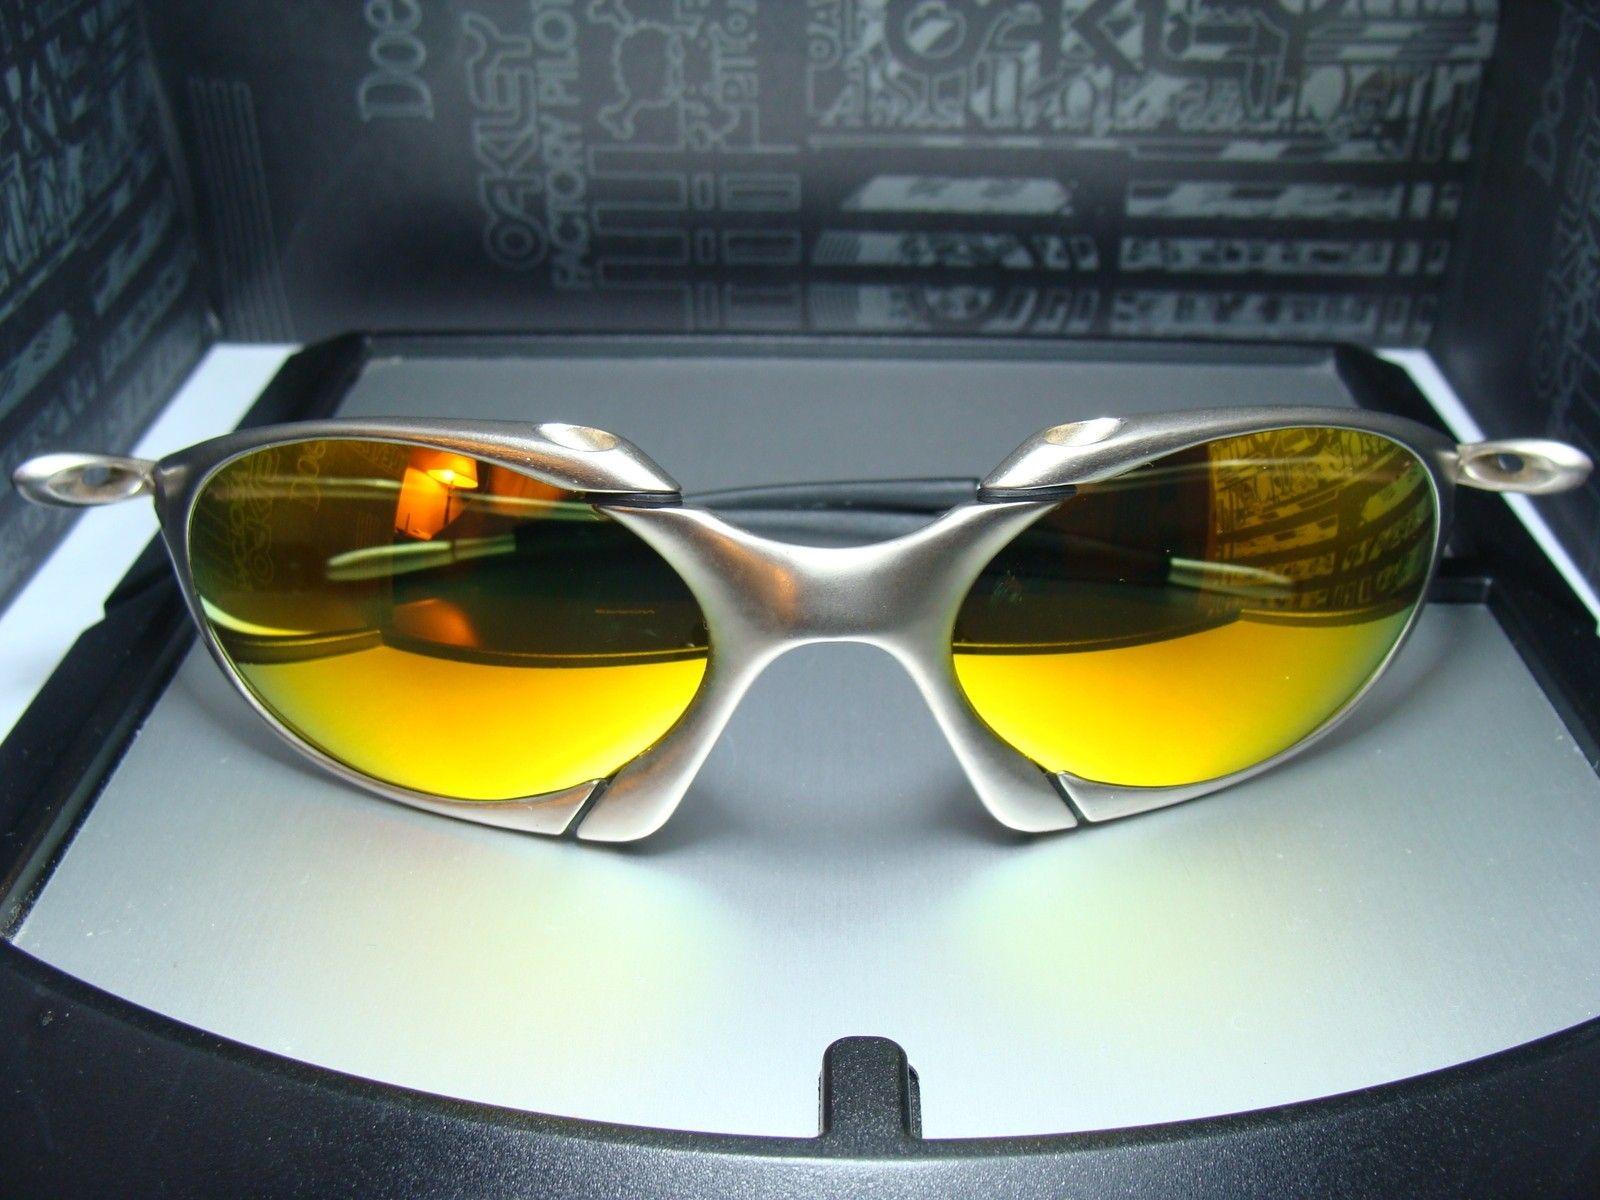 Brand New Romeo 1 Fire Iridium Custom Lenses - DSC04141.JPG